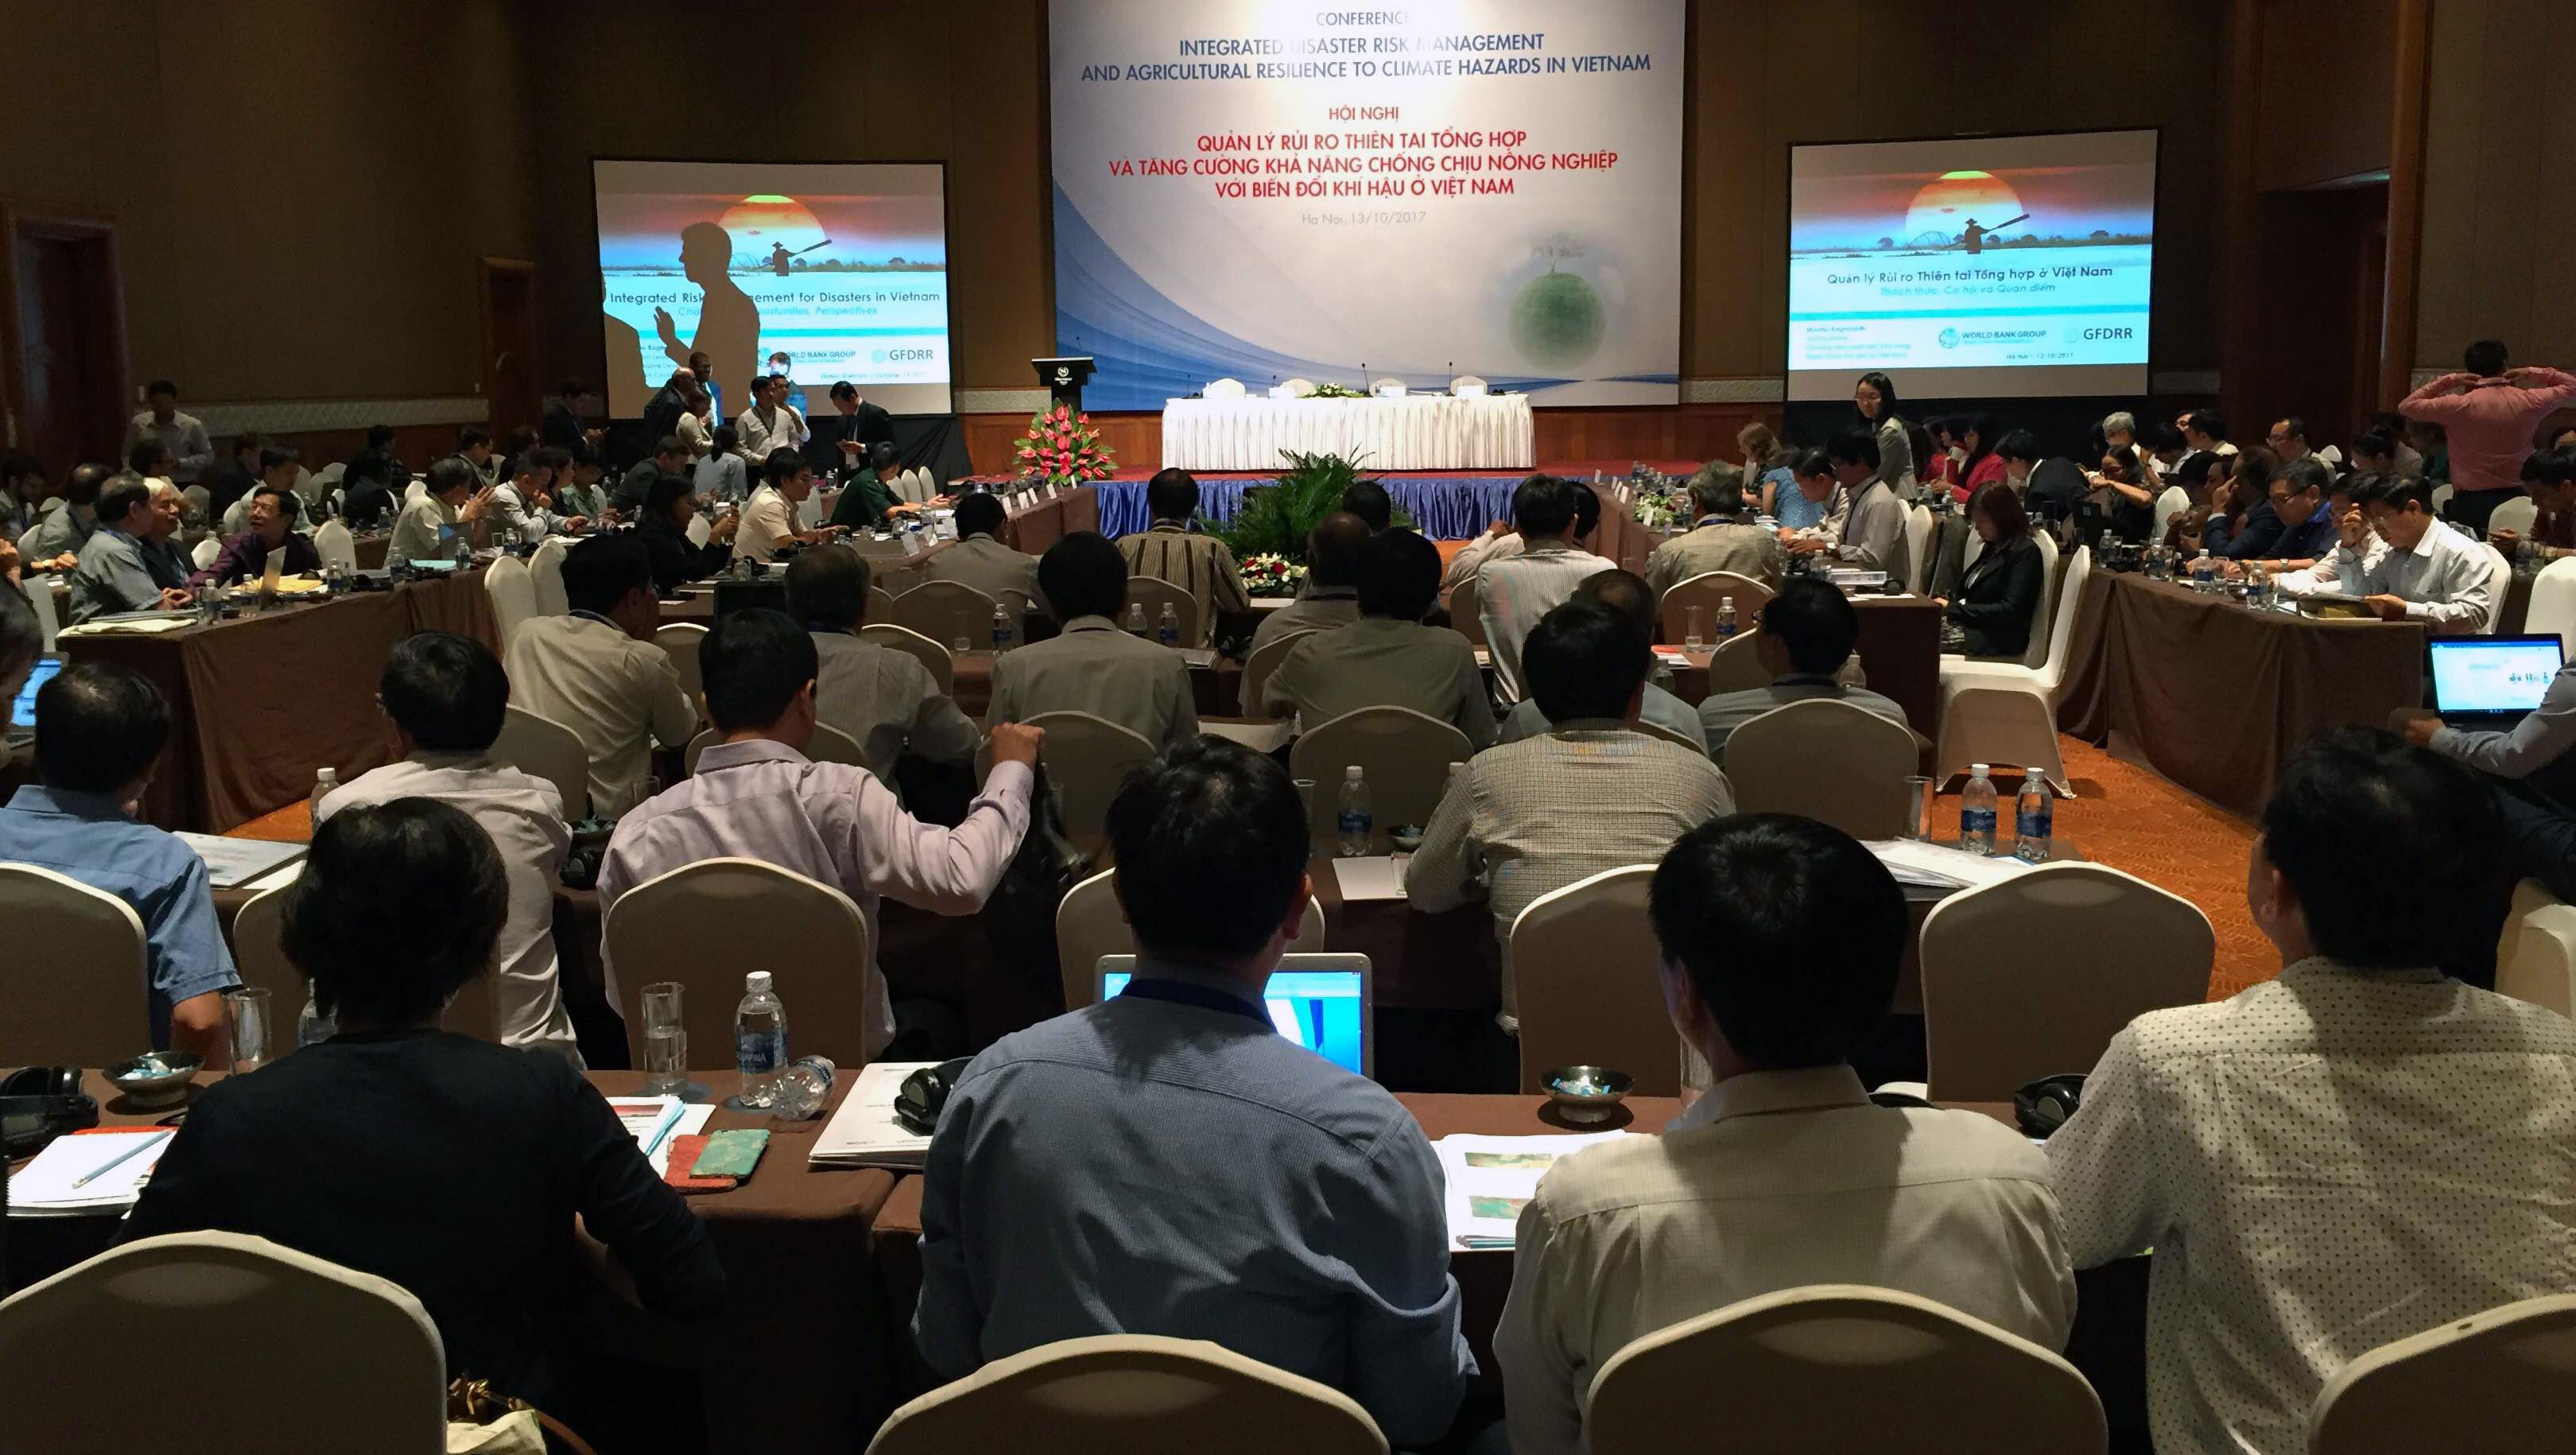 Vietnam seeks integrated strategy for disaster risks mitigation